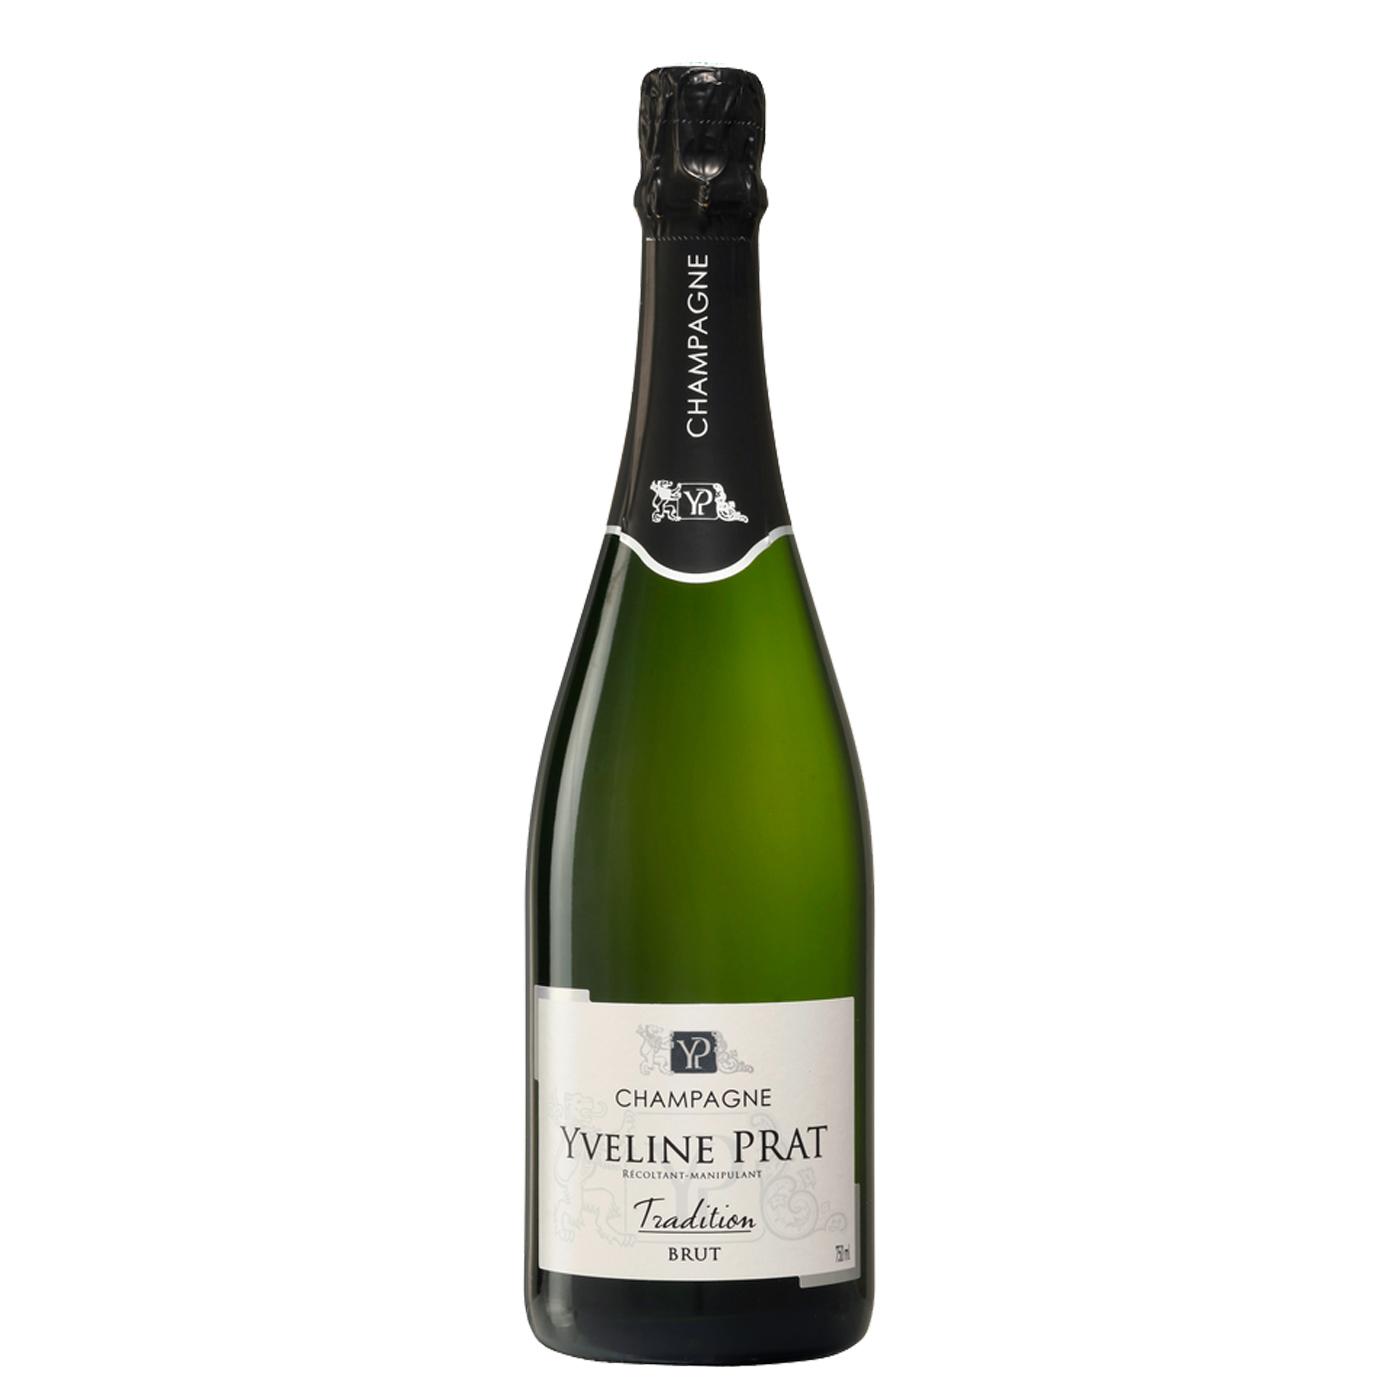 Champagne Yveline Prat Traditional Brut